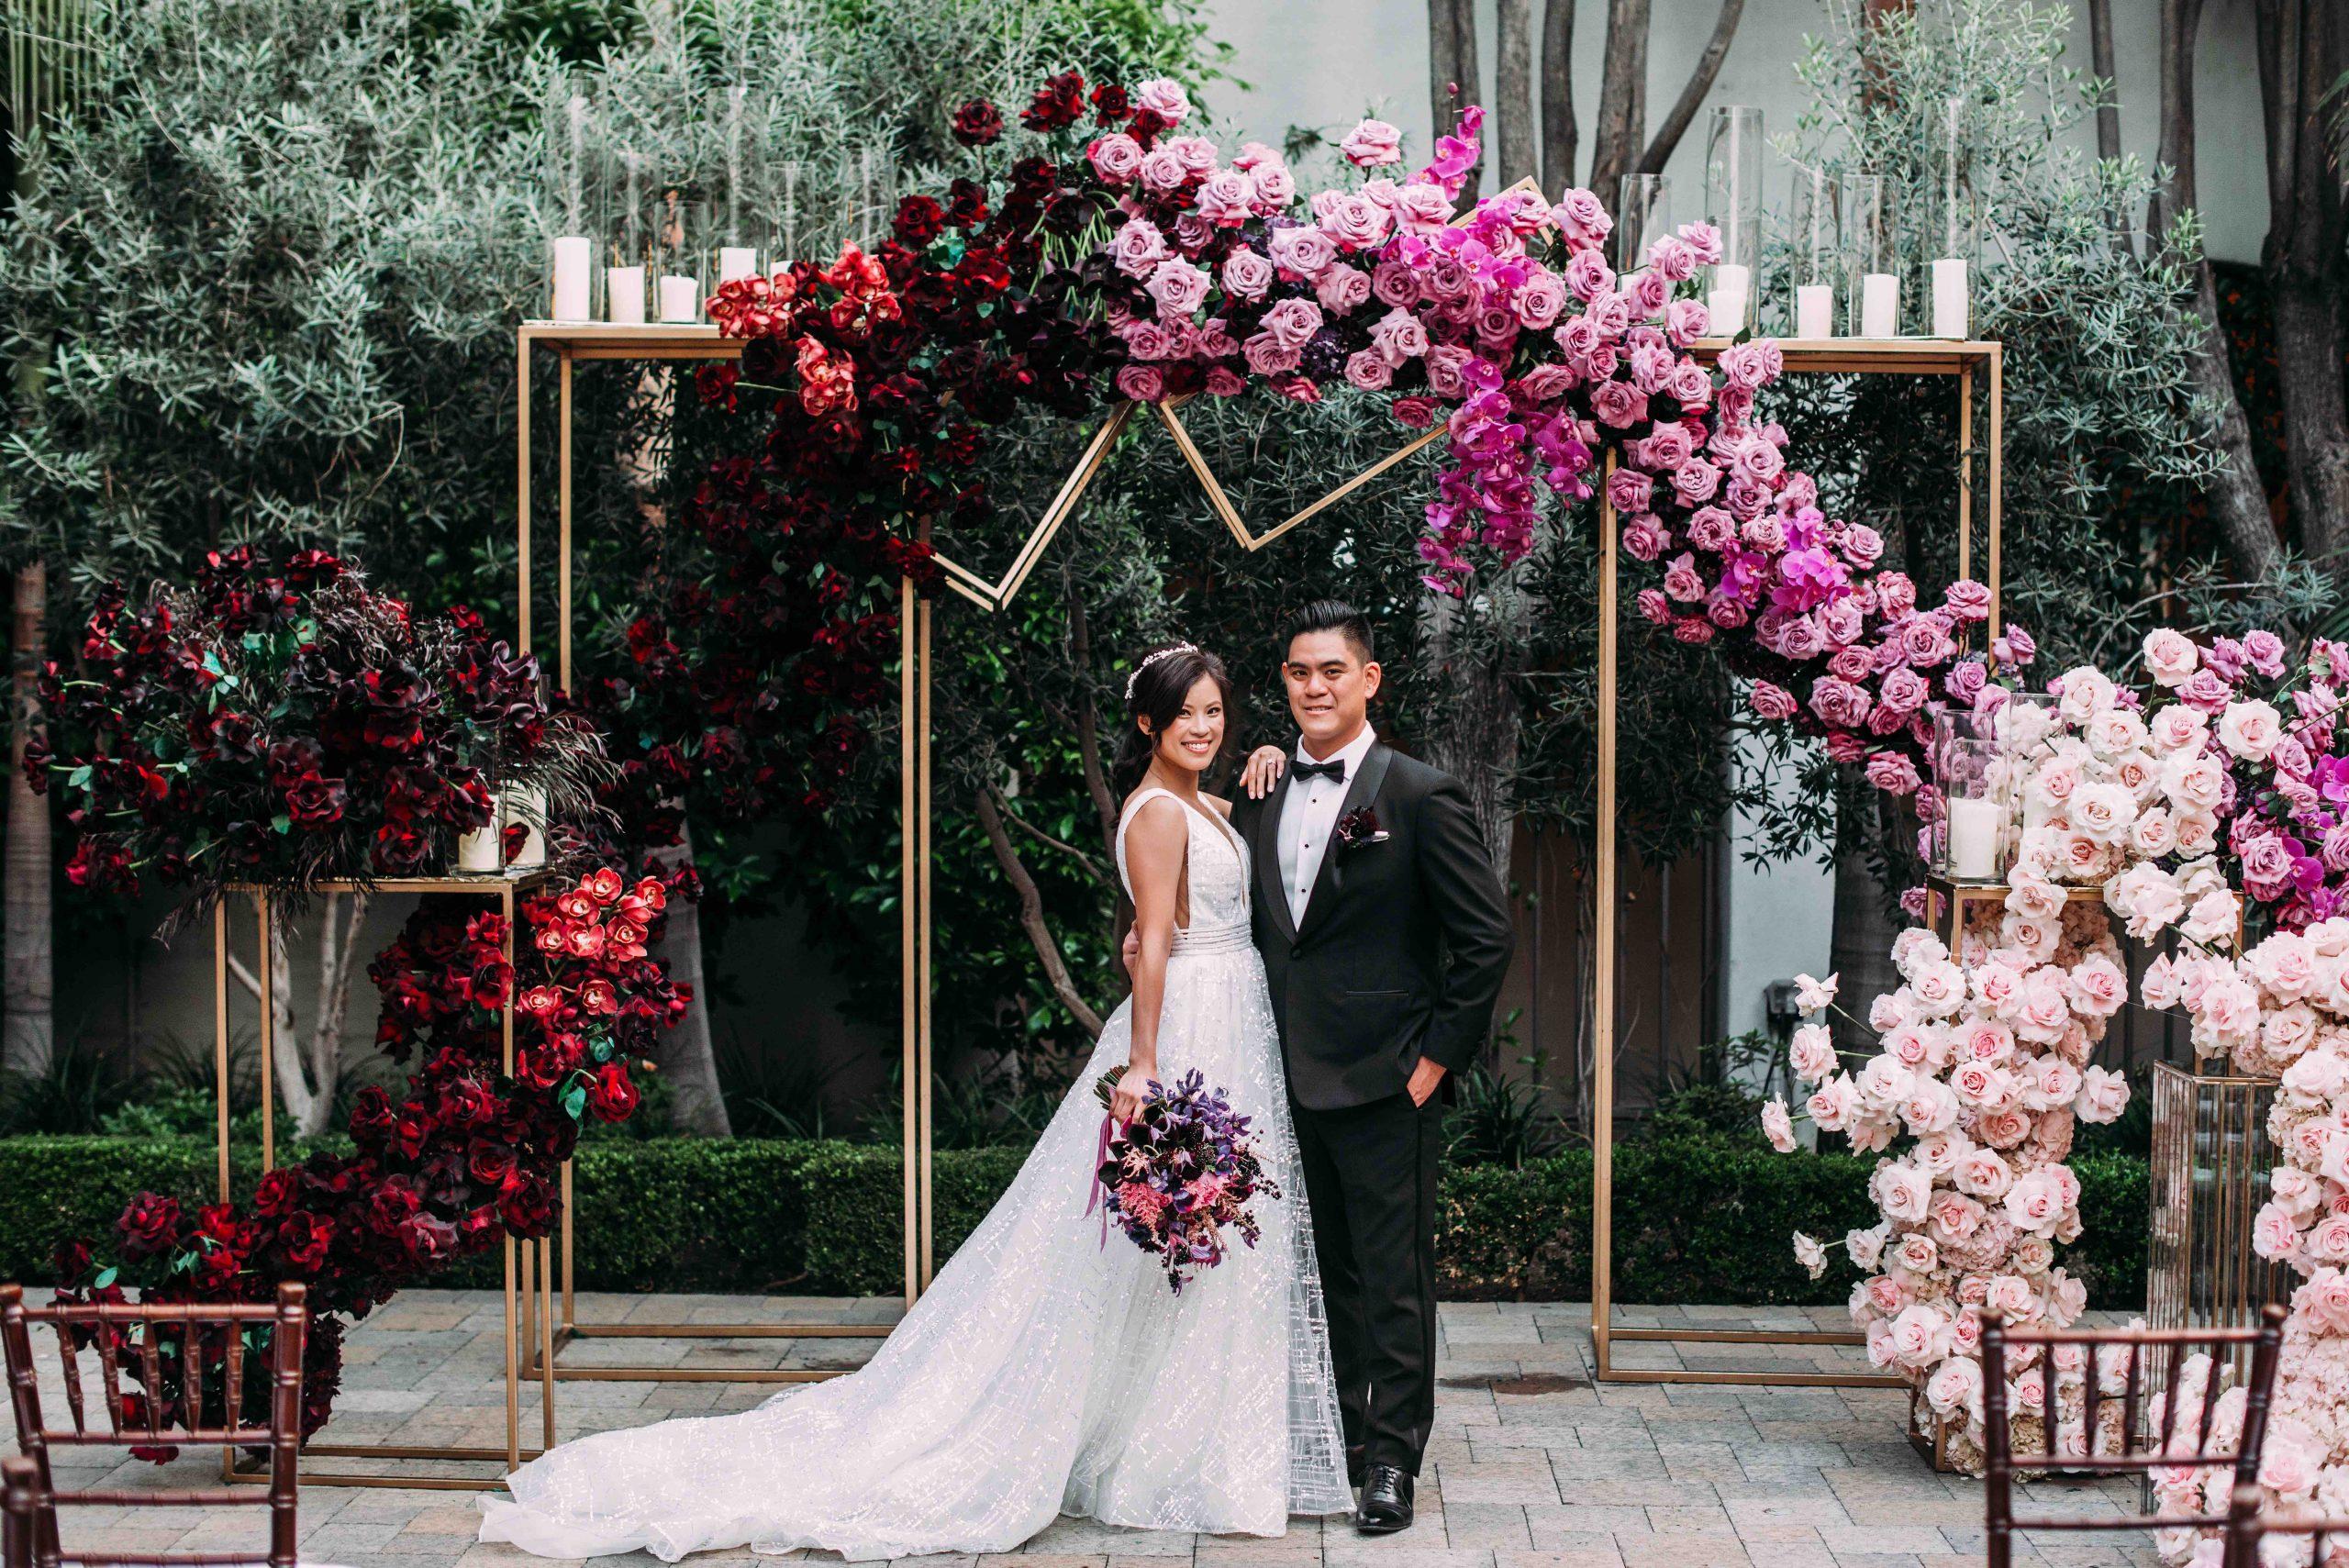 Best Wedding Photographer in Los Angeles LifeStory.Film at Vibiana DTLA